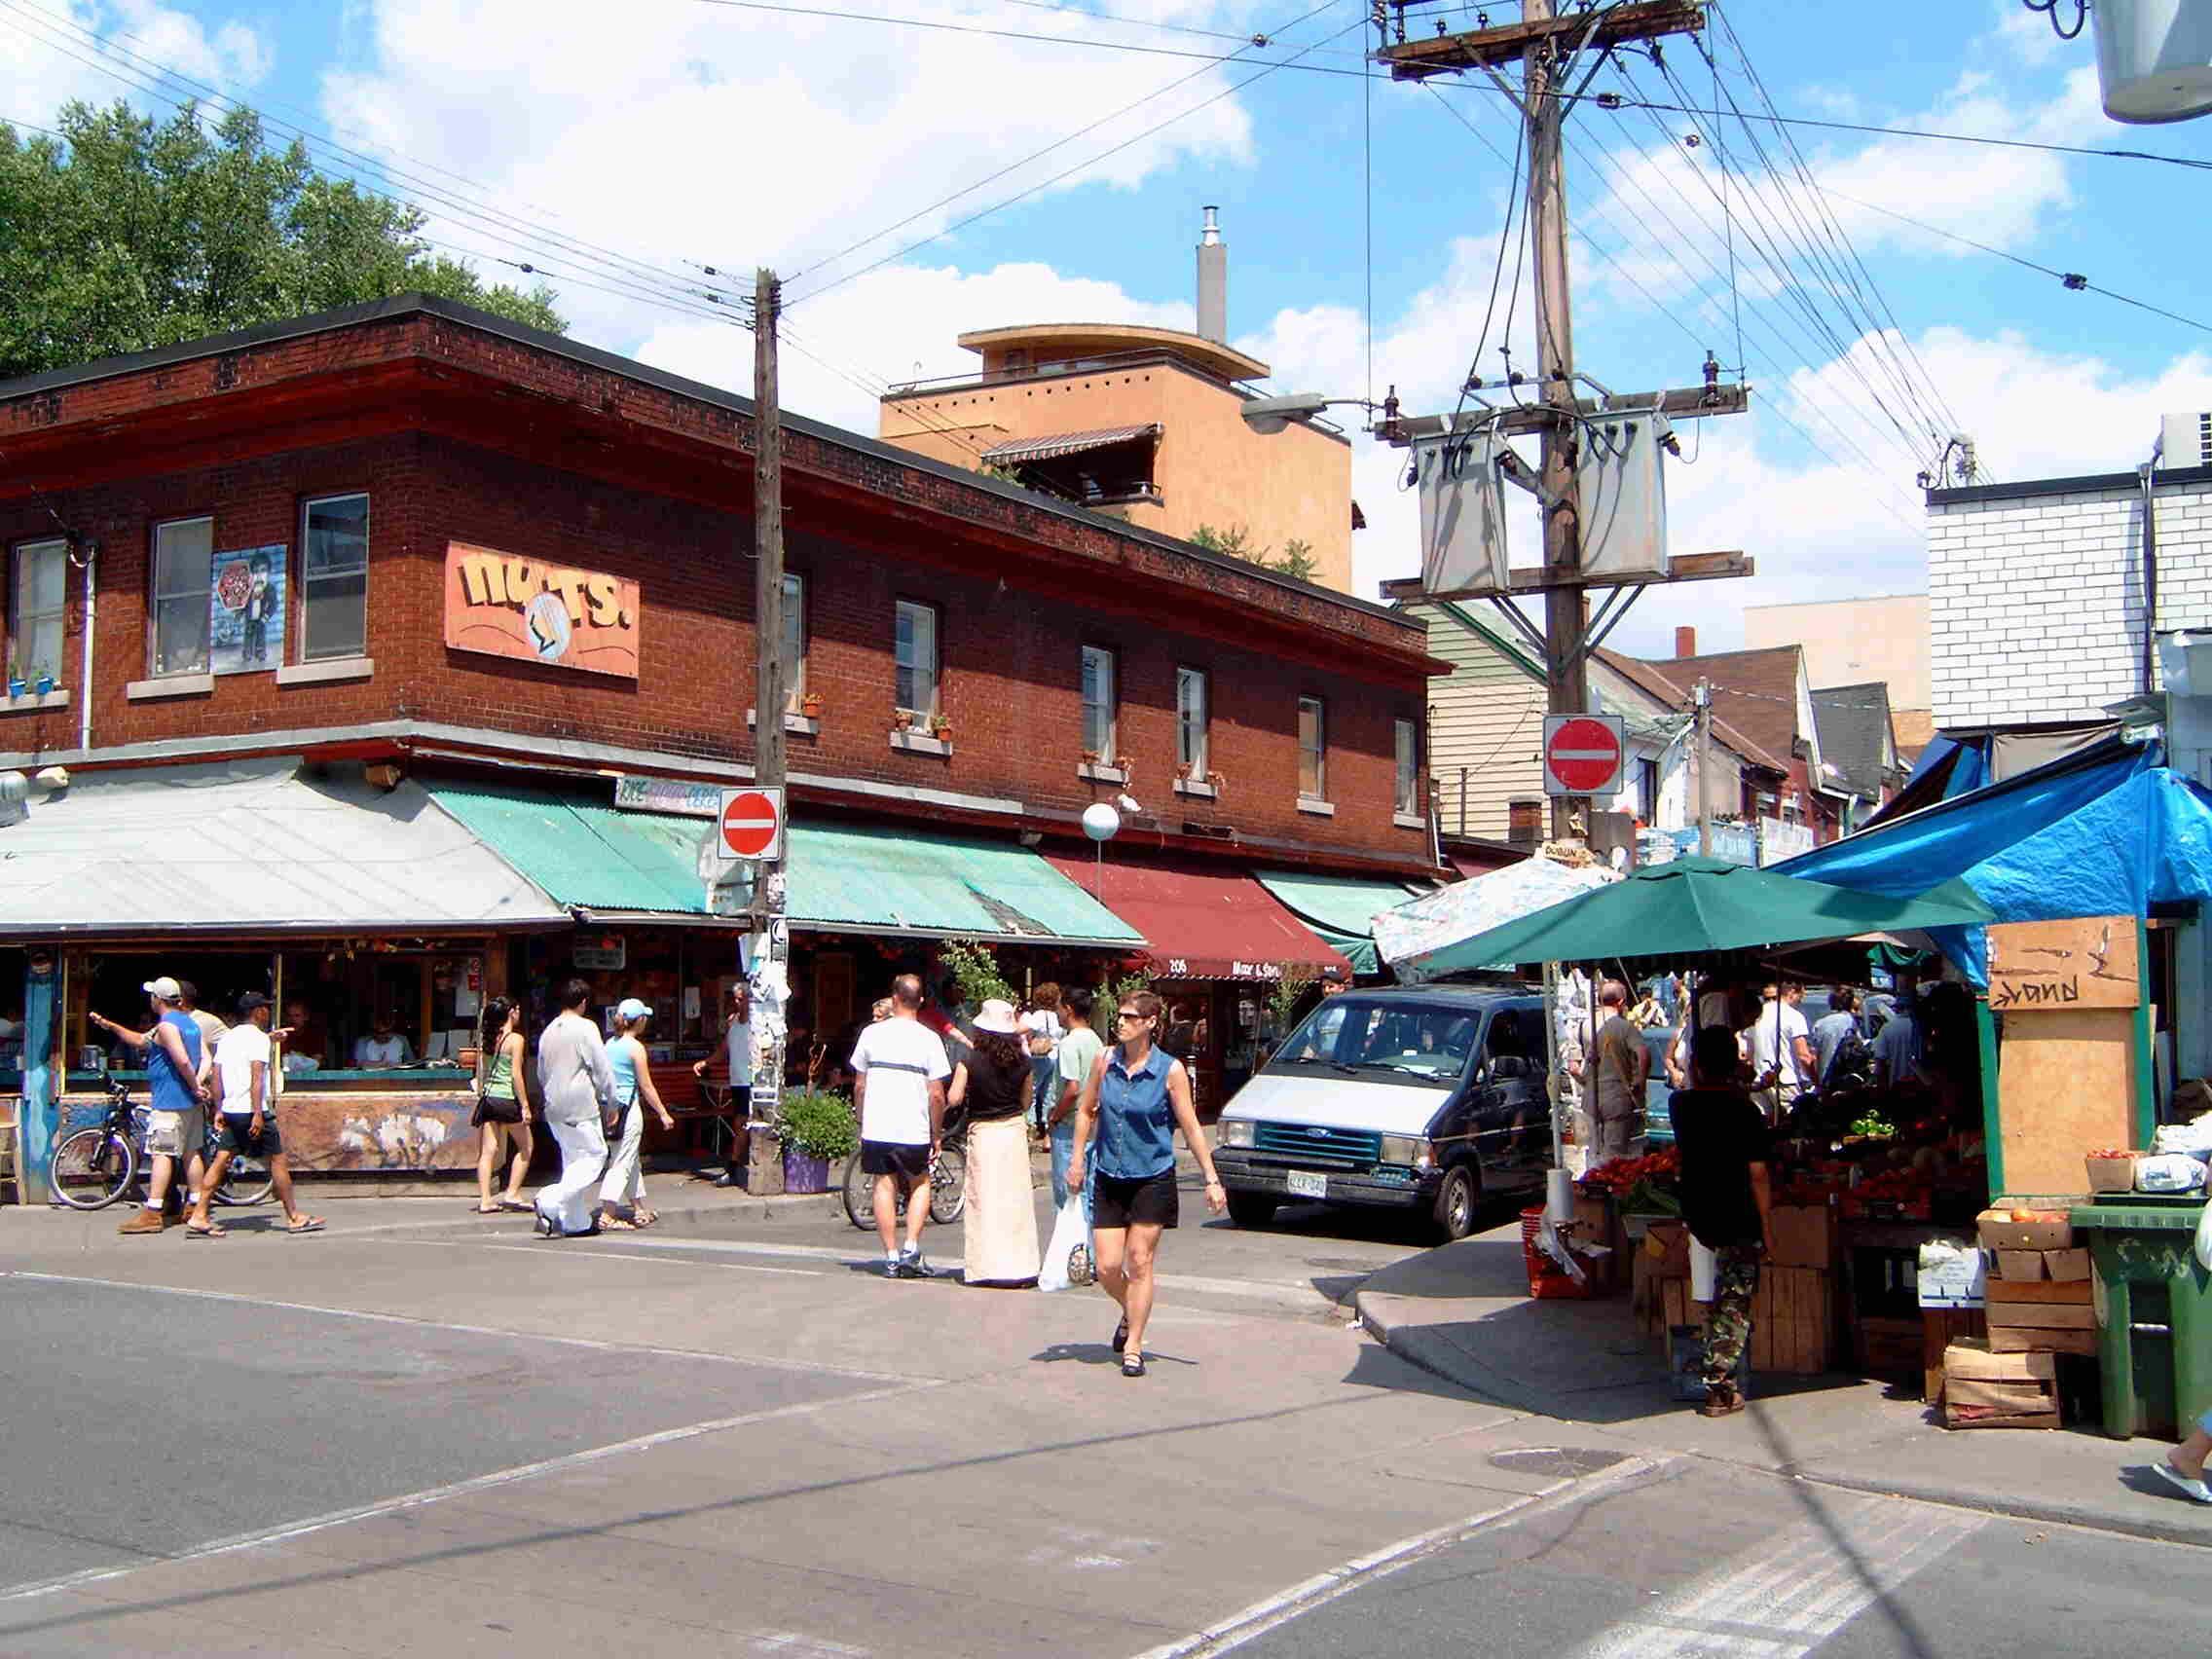 Kensington_market